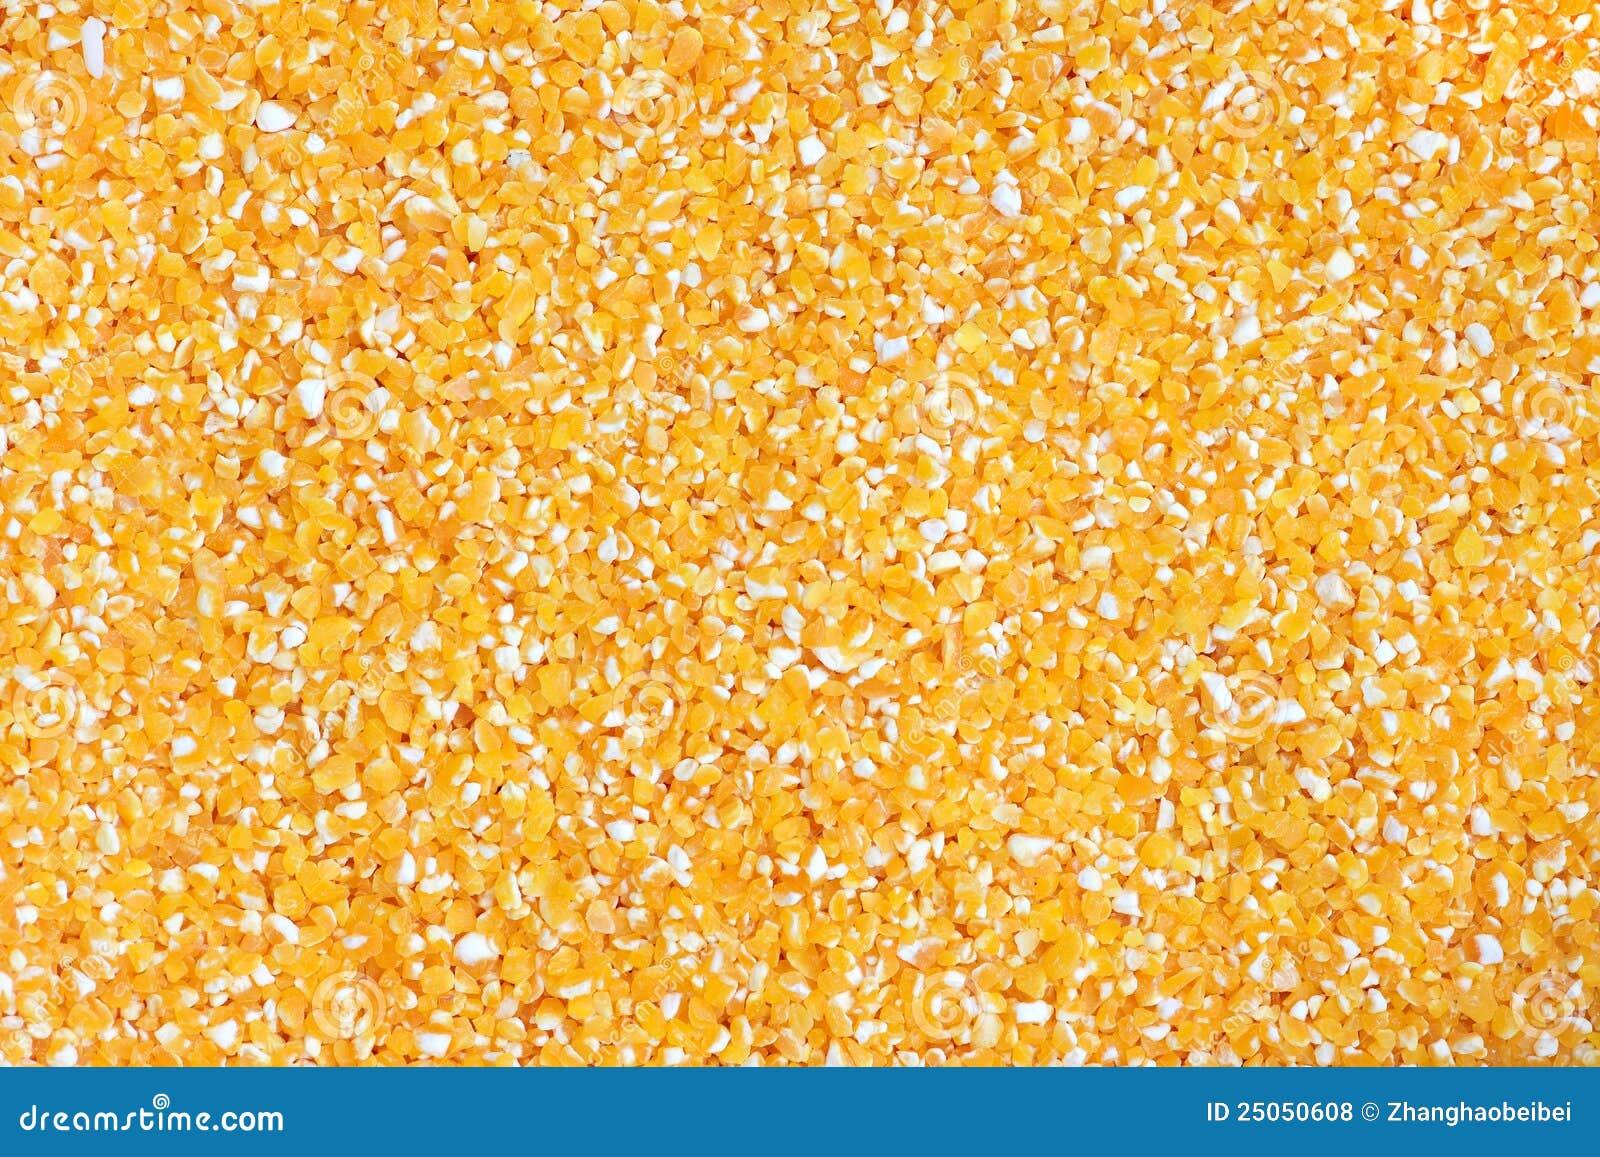 Núcleos de maíz hechos fragmentos